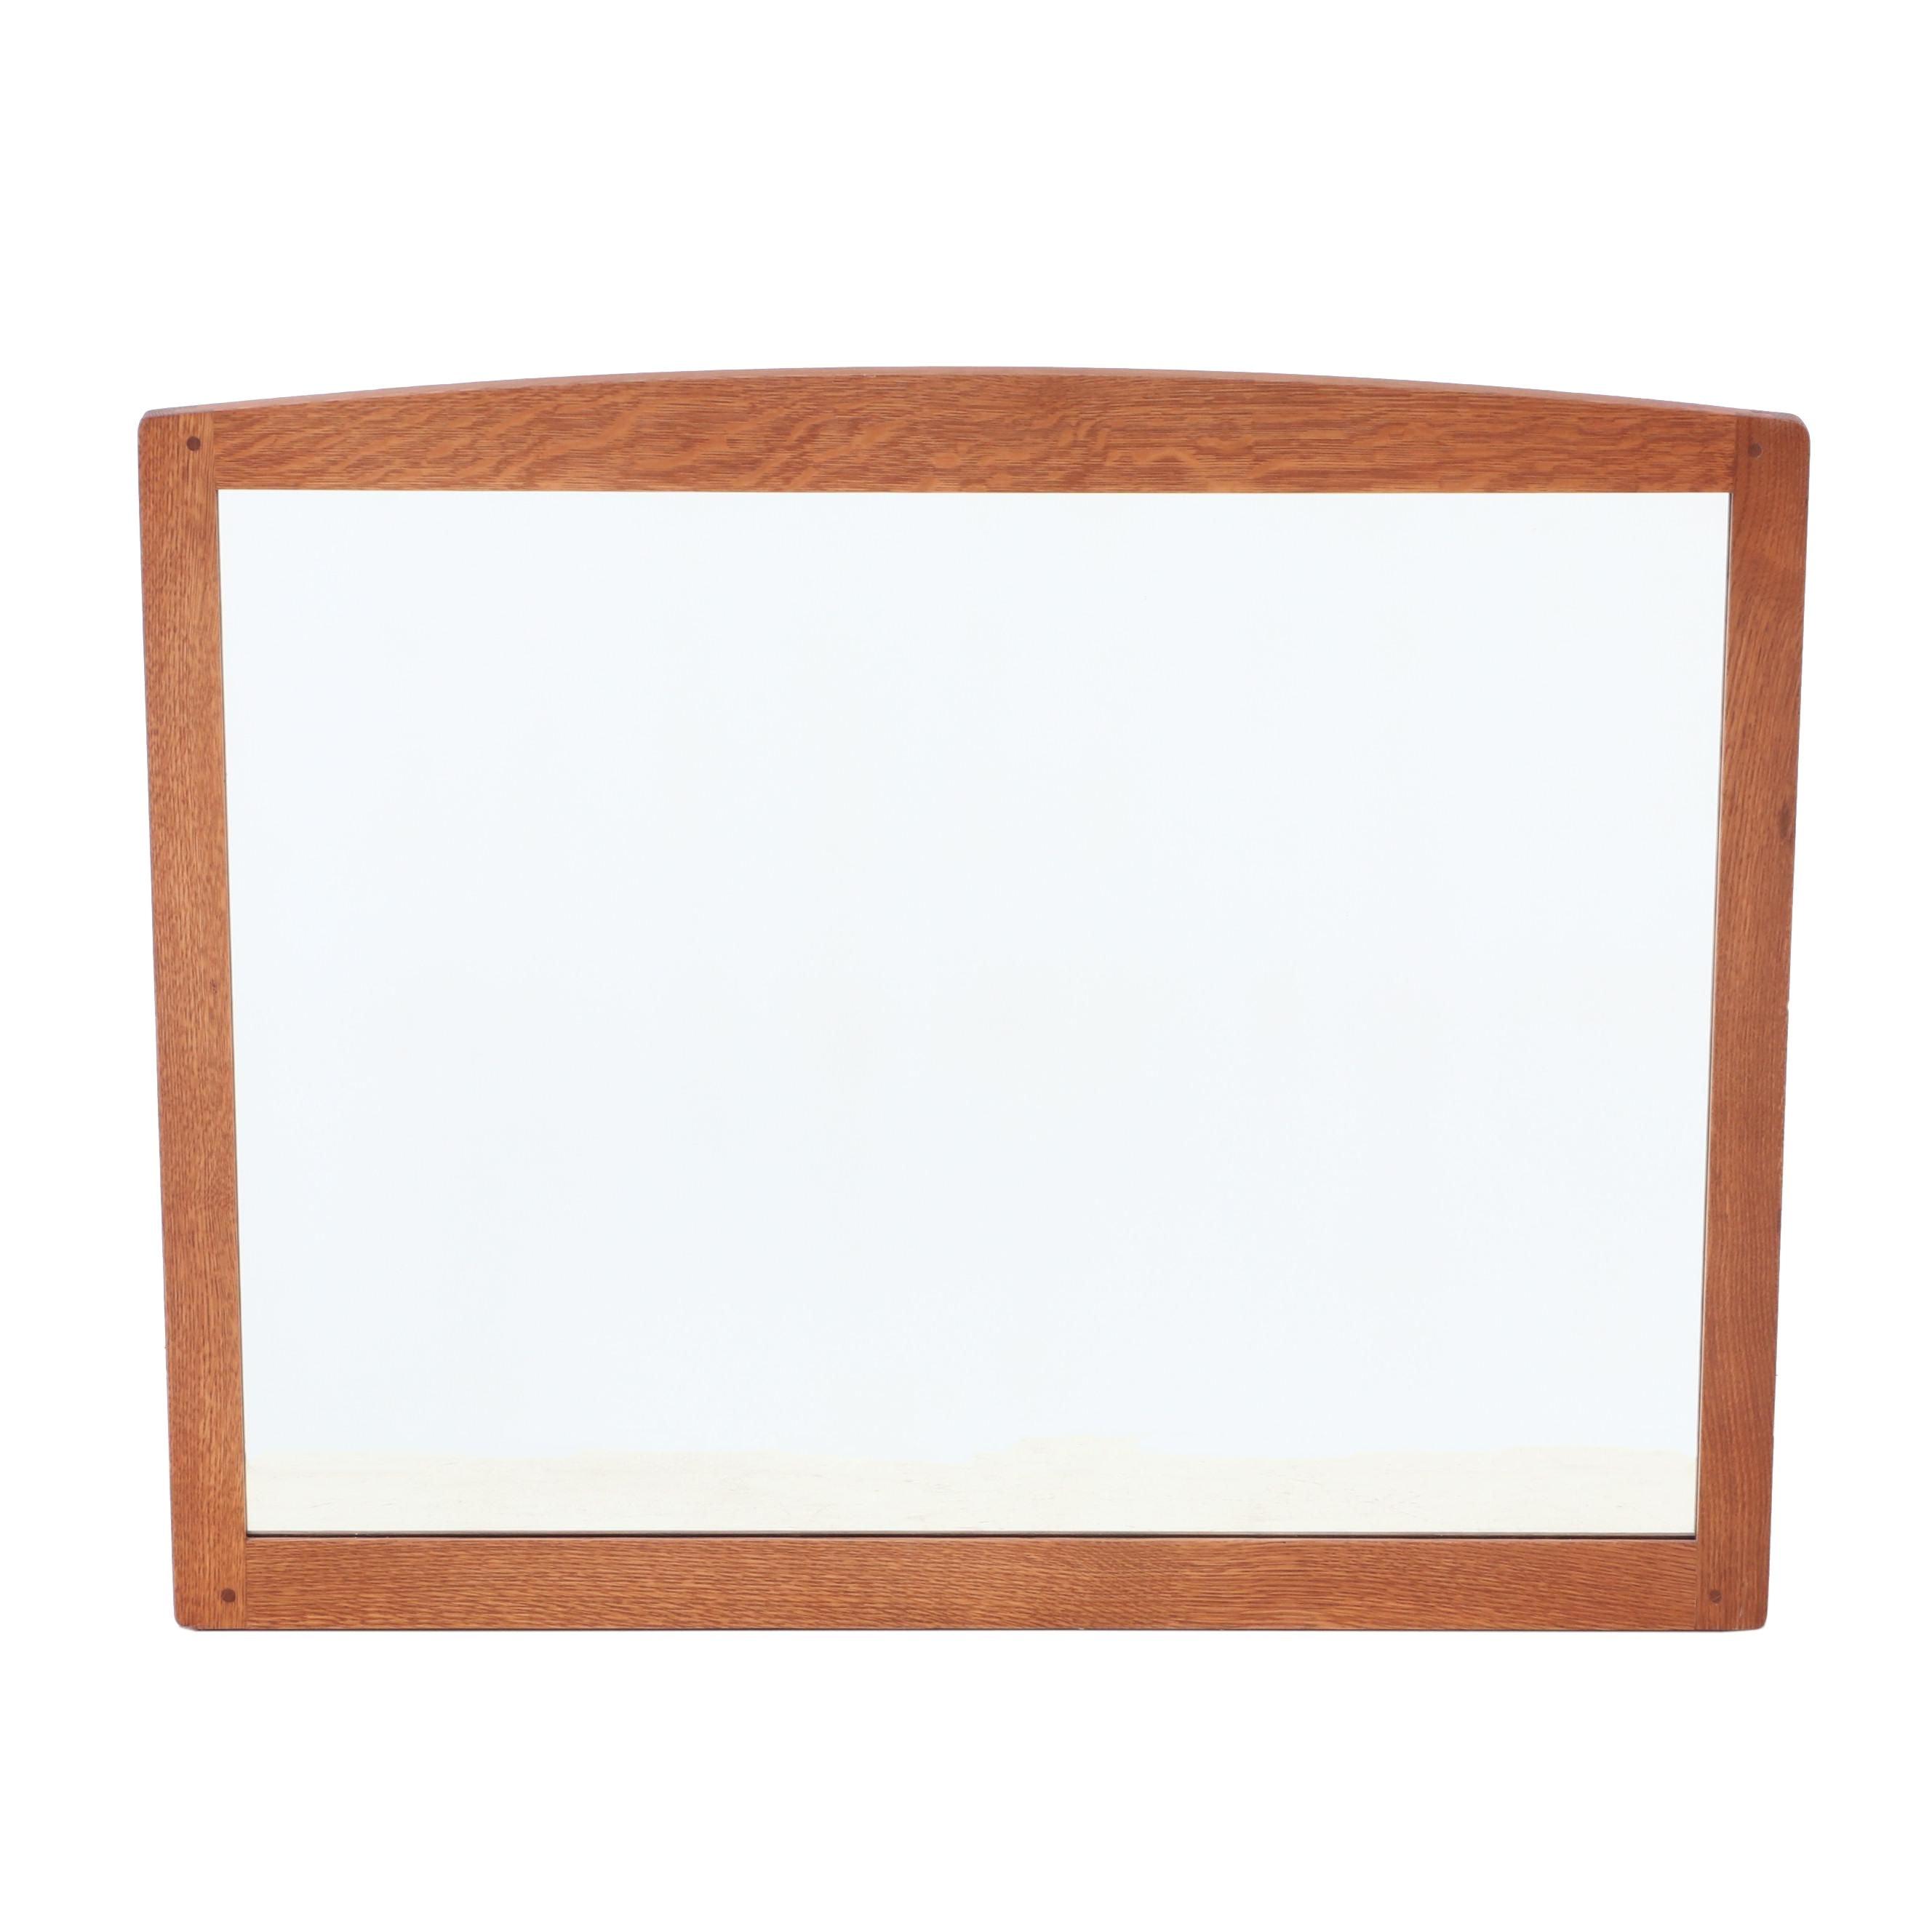 Stickley Mission Oak Wall Mirror